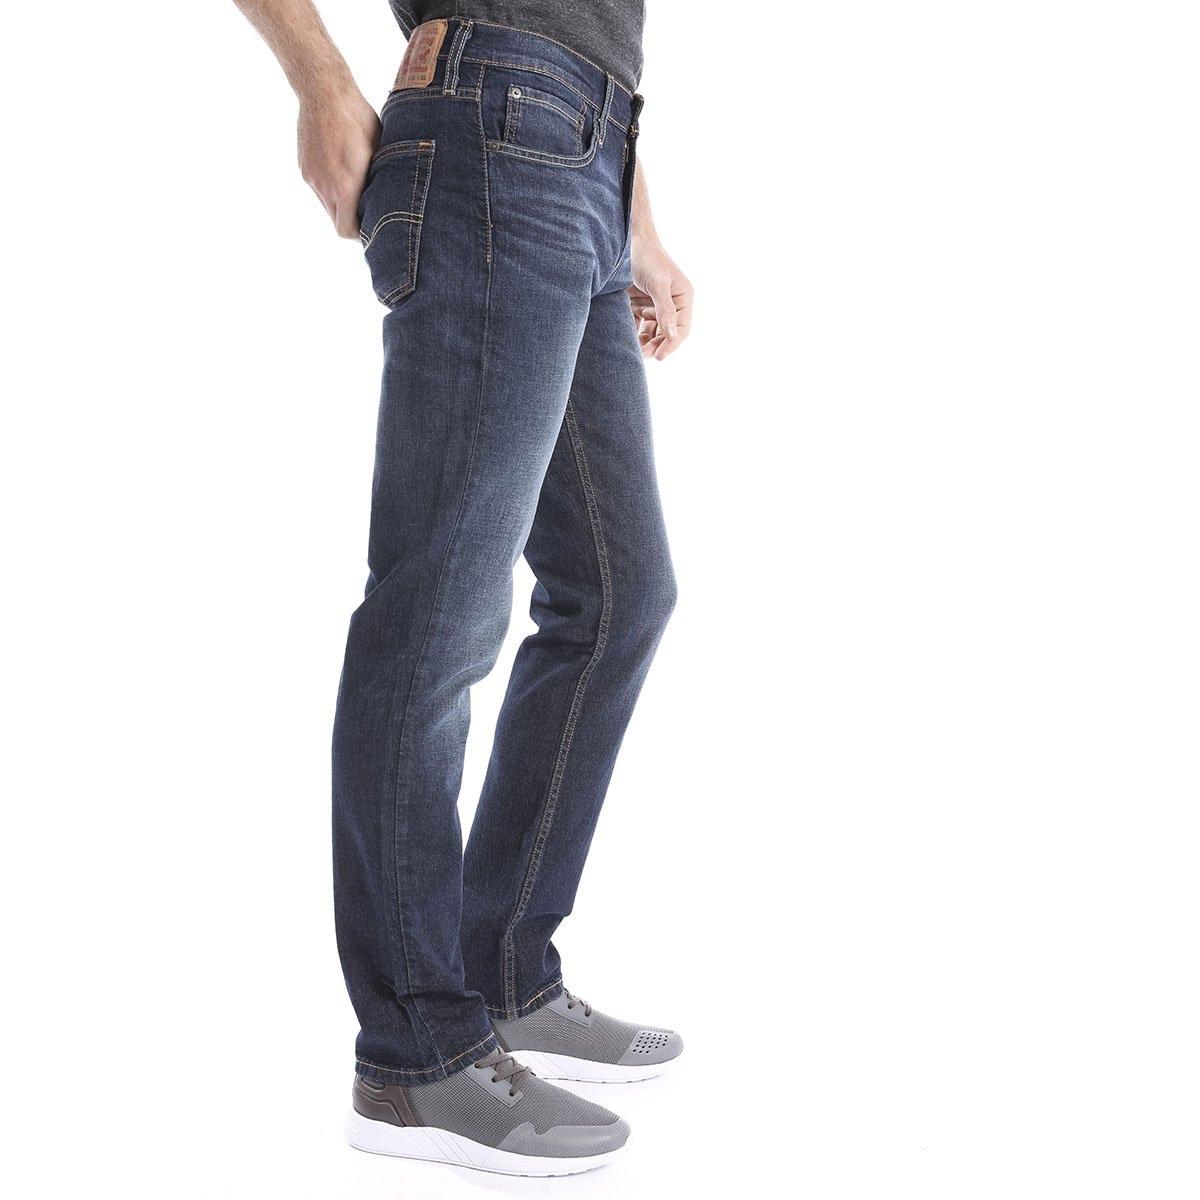 Jeans 511? Slim Fit Levi's